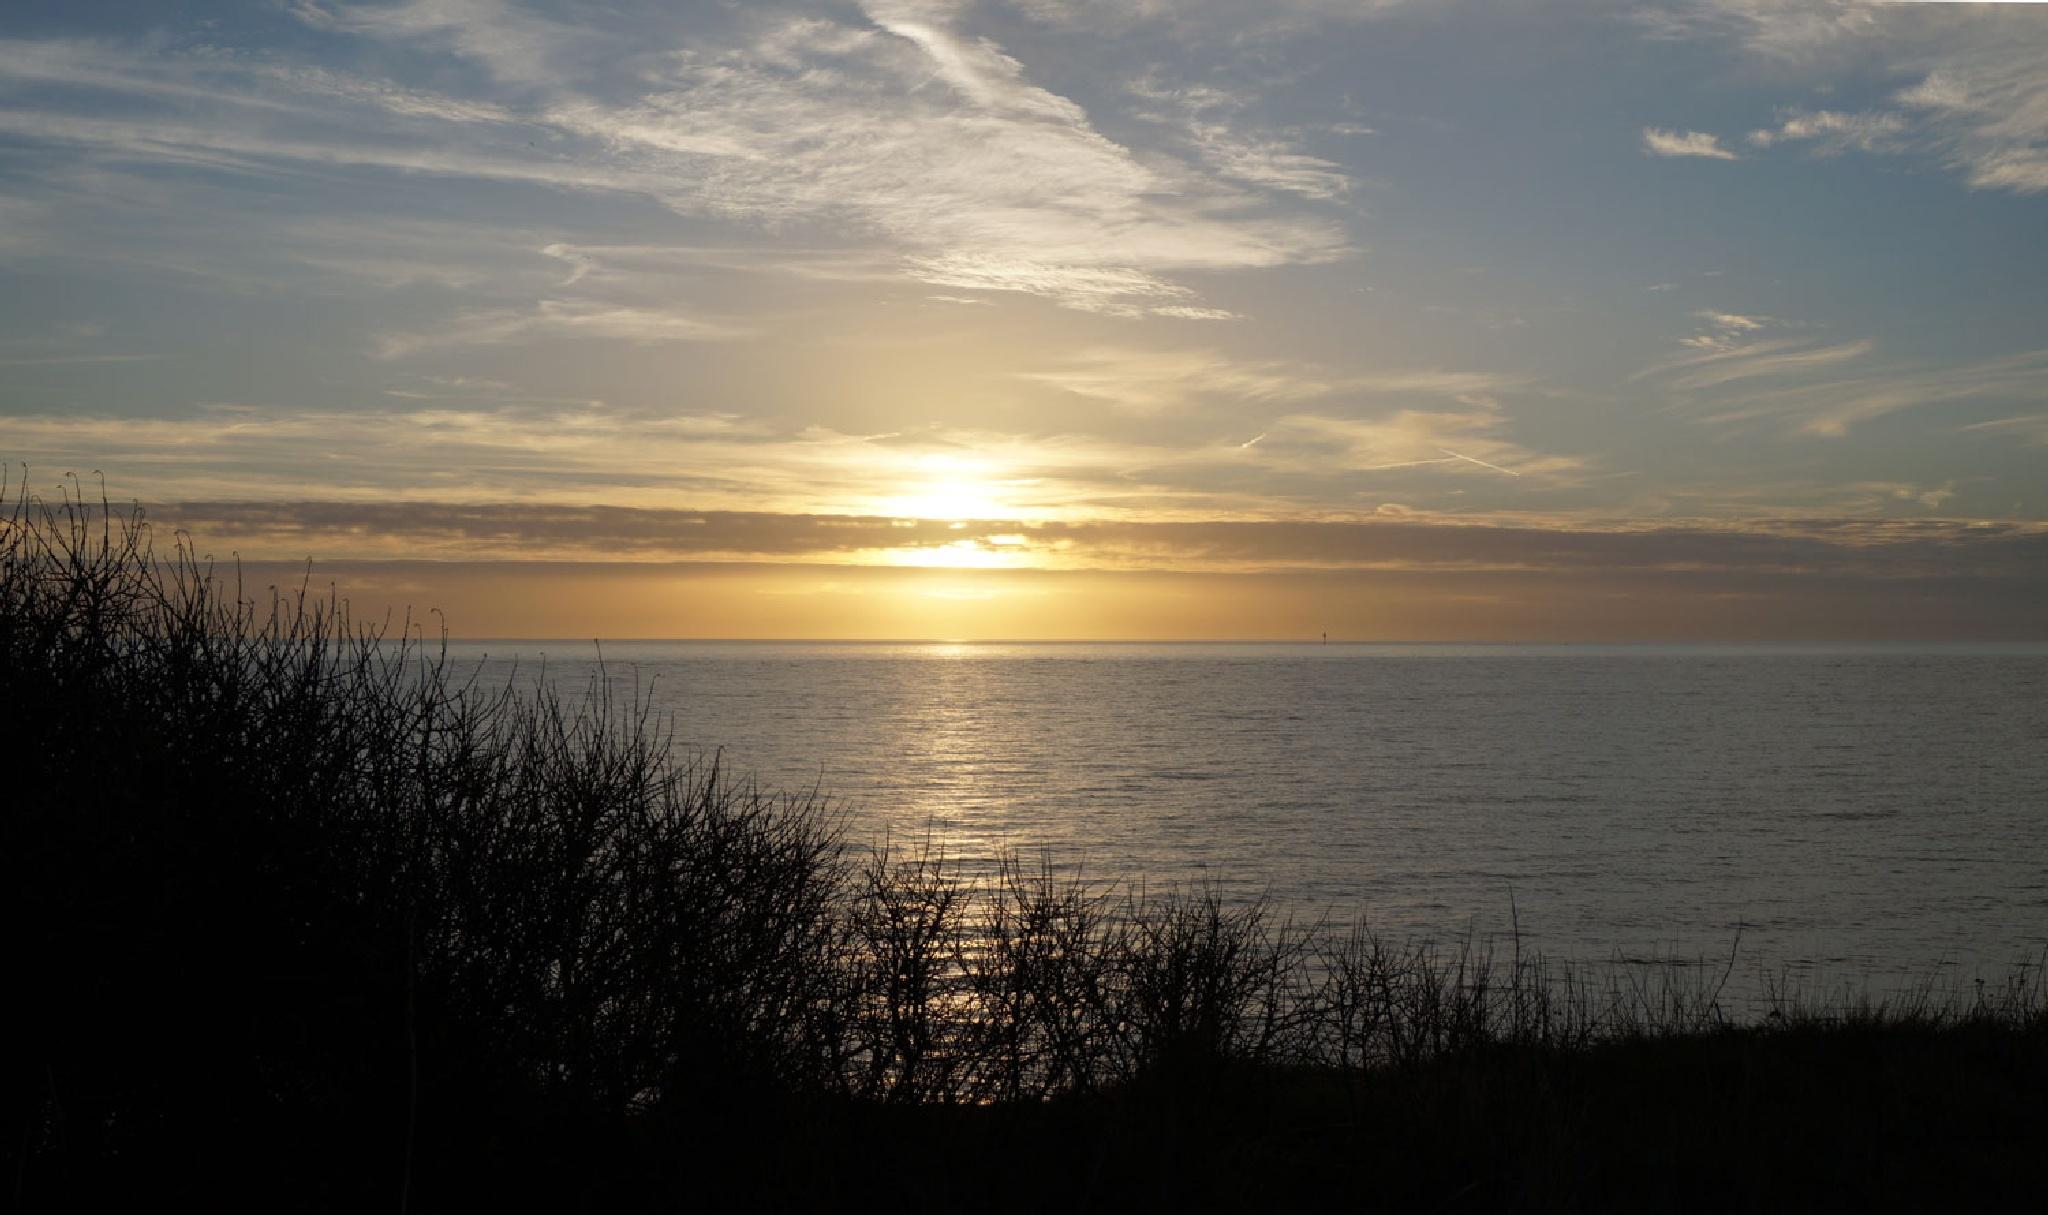 afternoon sunset by vedvejen